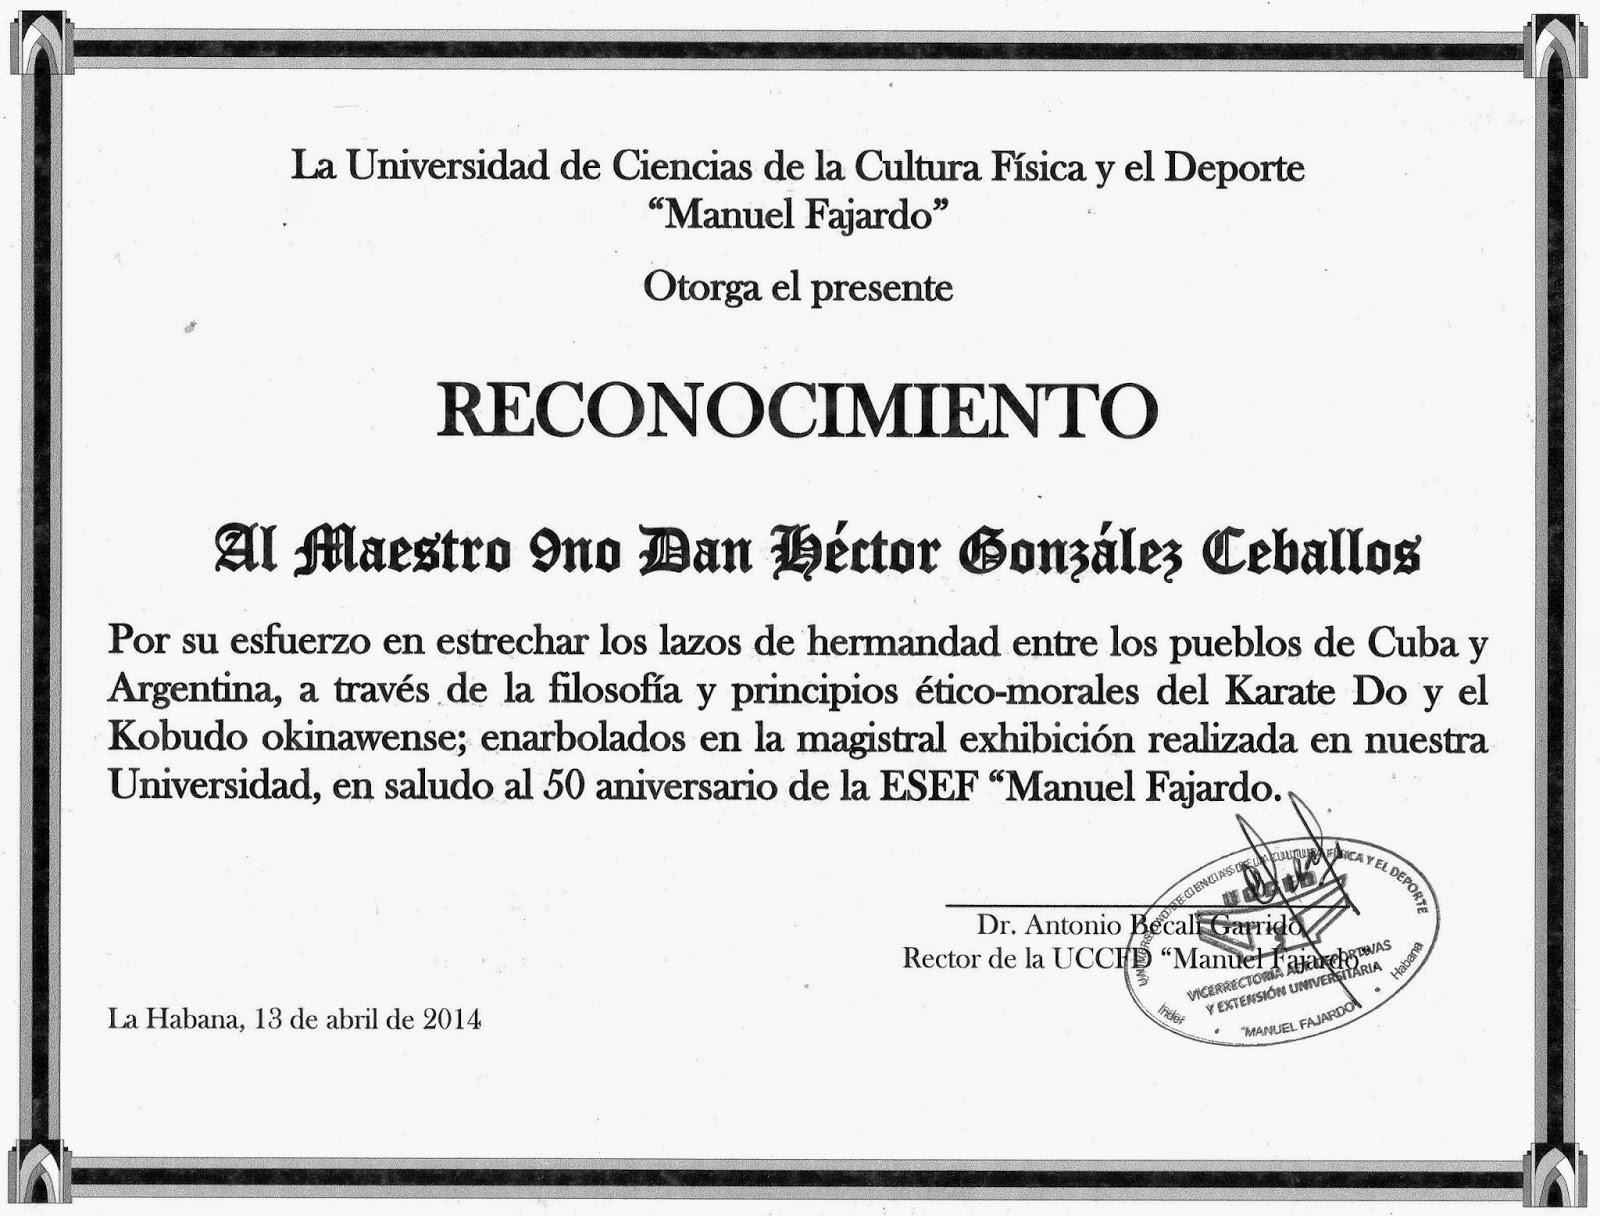 Maestro González Ceballos ejecuta kata de kama. Ceremonia de cierre a